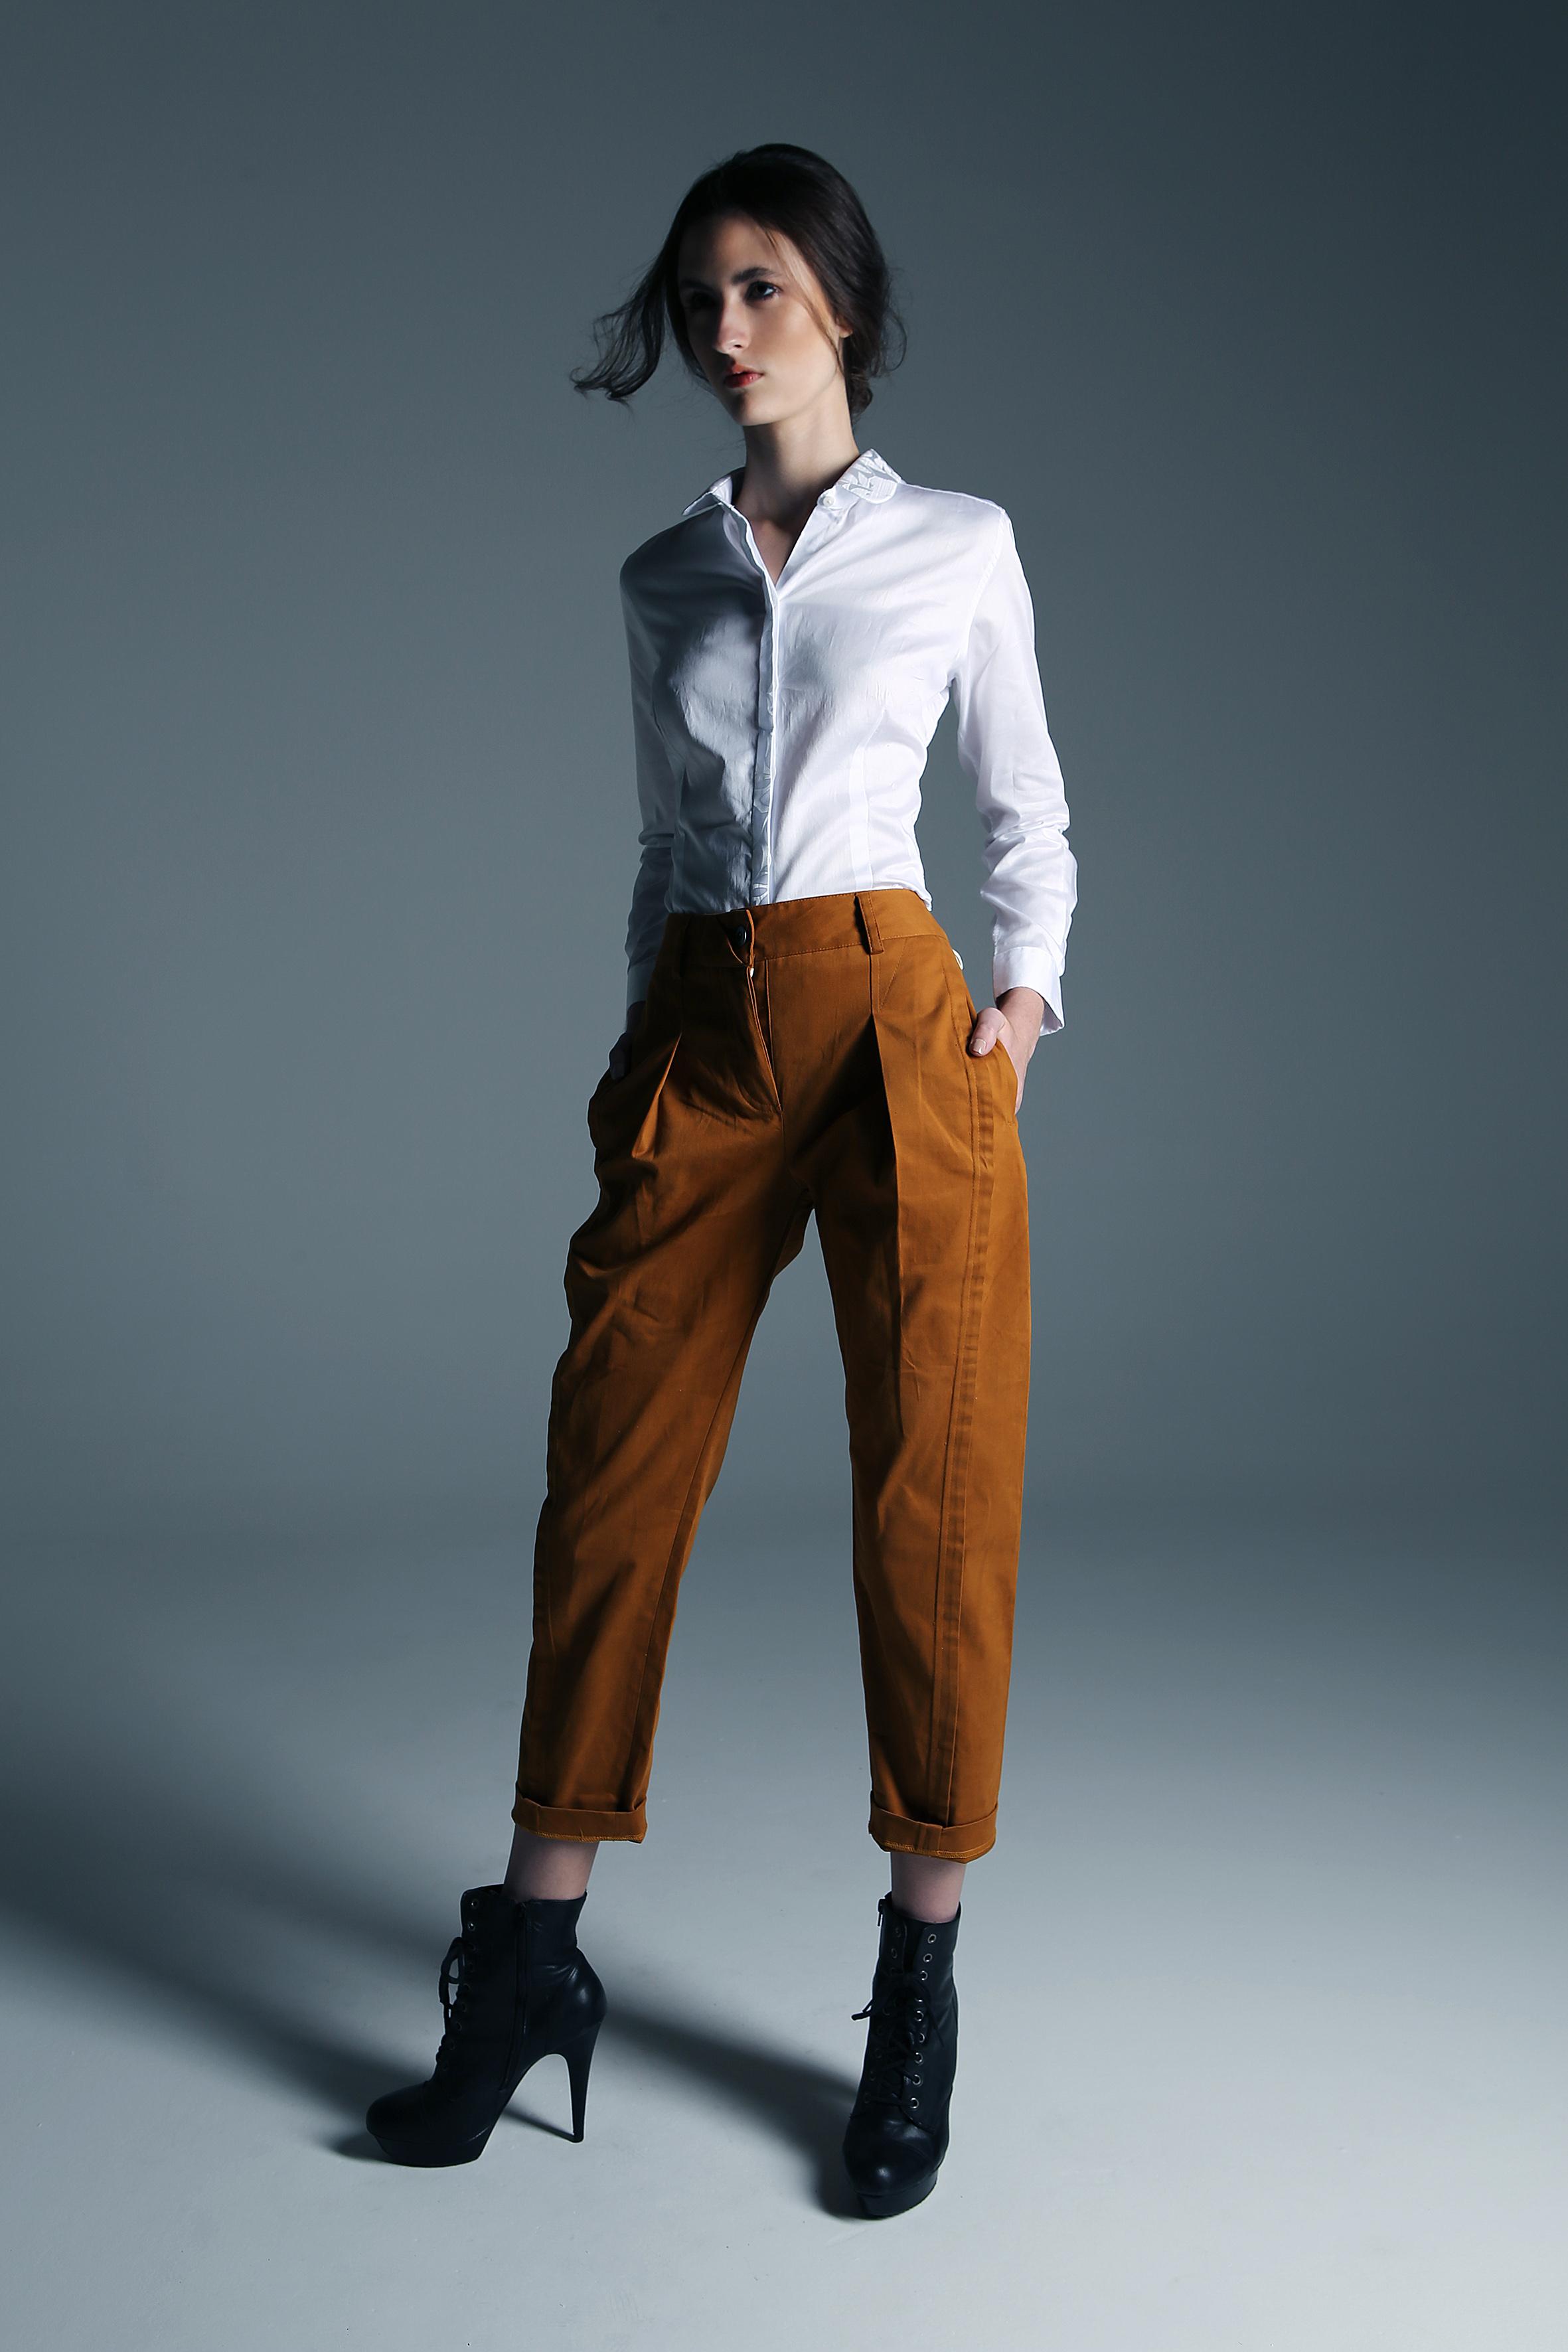 Leila Zandonai para way model